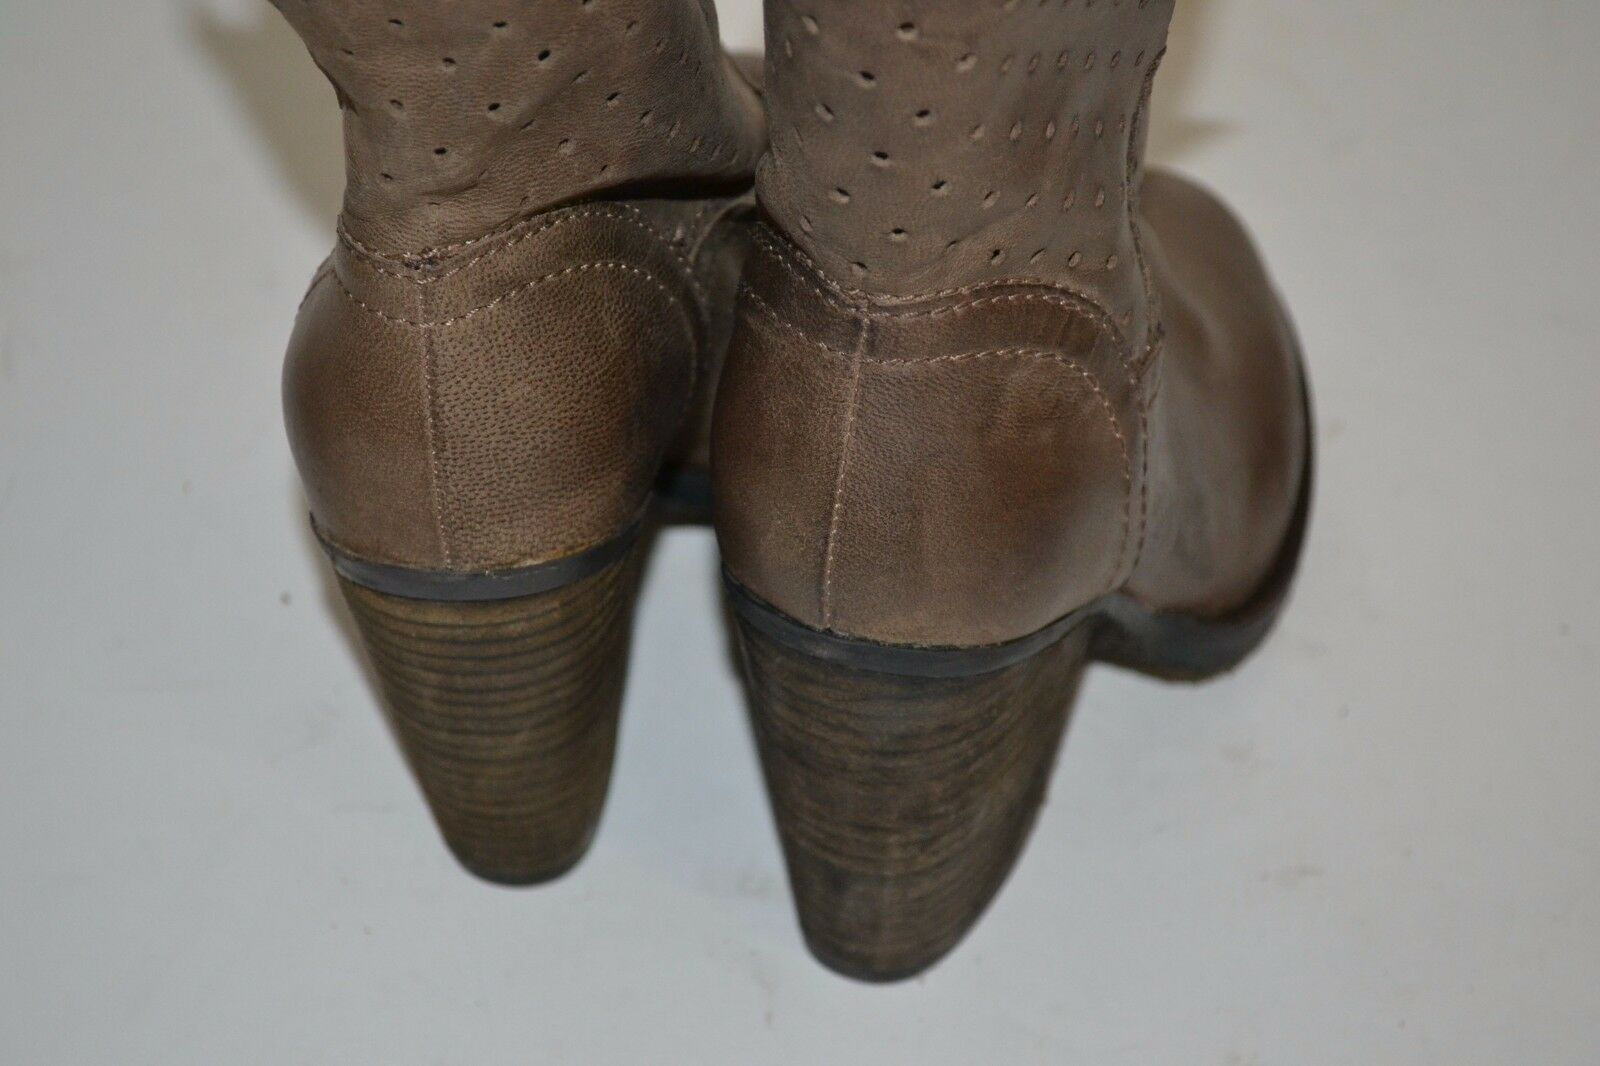 Steven Steve Madden Kobrra Mujer Cuero Cuero Cuero Moda botas al Tobillo Marrón Topo Talla 6  169 d095e9